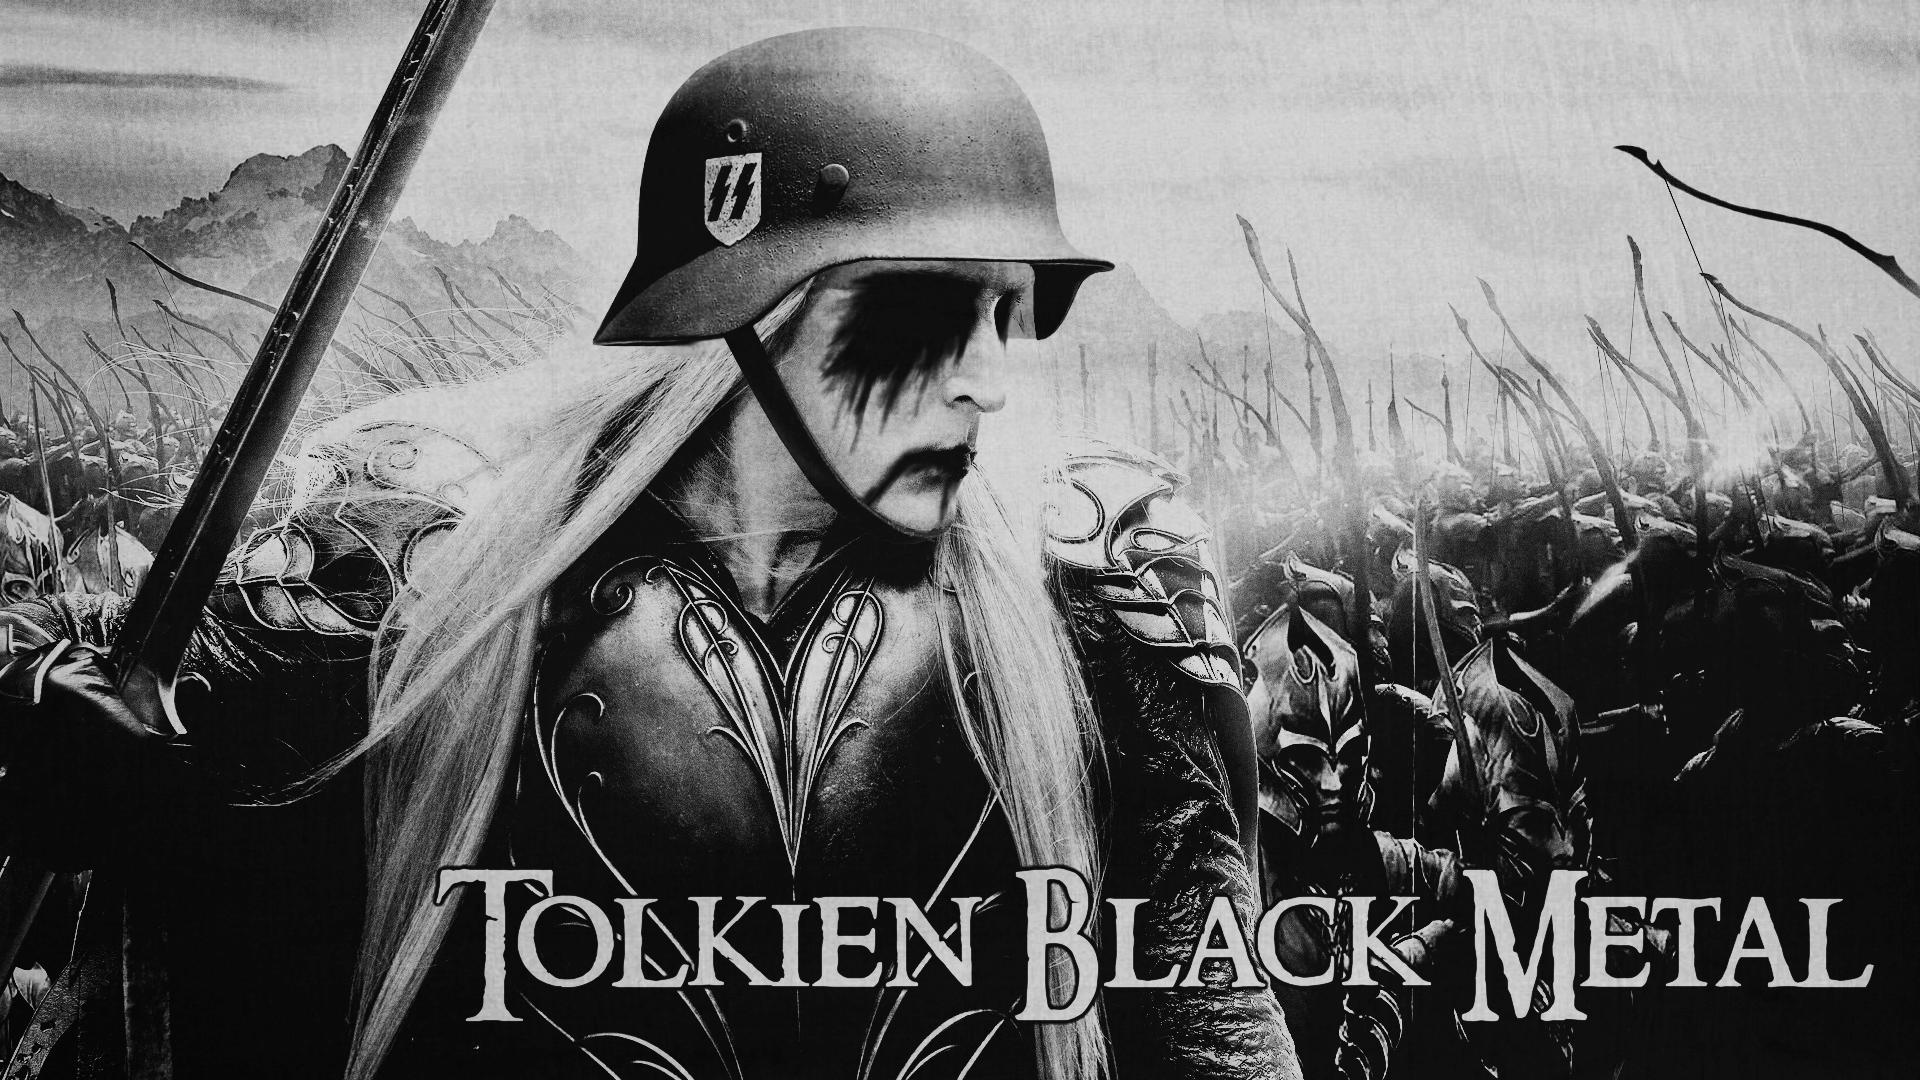 Tolkien Black Metal Hd Wallpaper Black Metal Wallpaper Black Metal Wallpaper Hd 486887 Hd Wallpaper Backgrounds Download